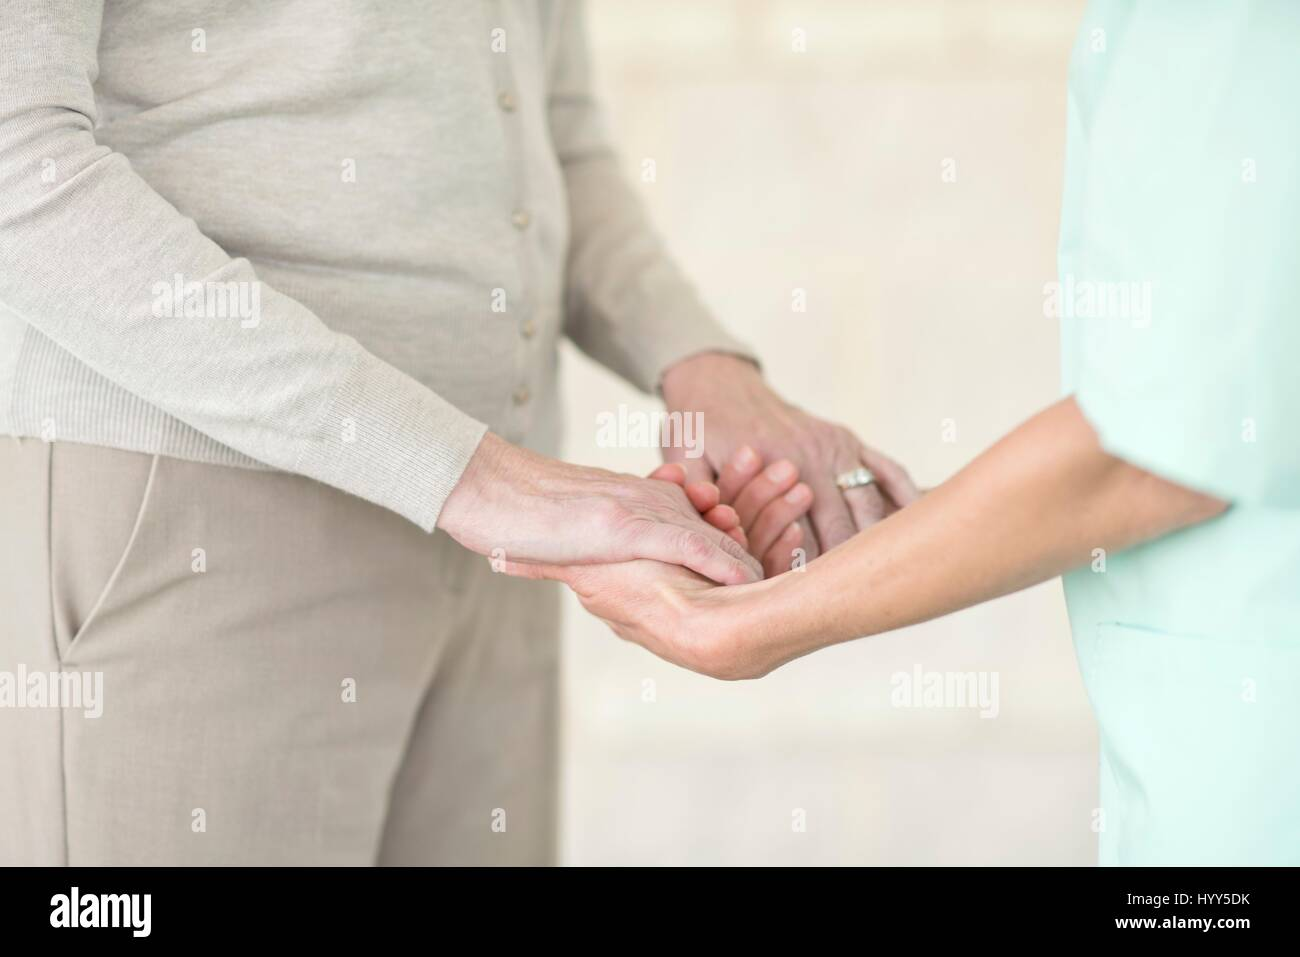 Pflegedienst senior Frau Händchenhalten. Stockbild